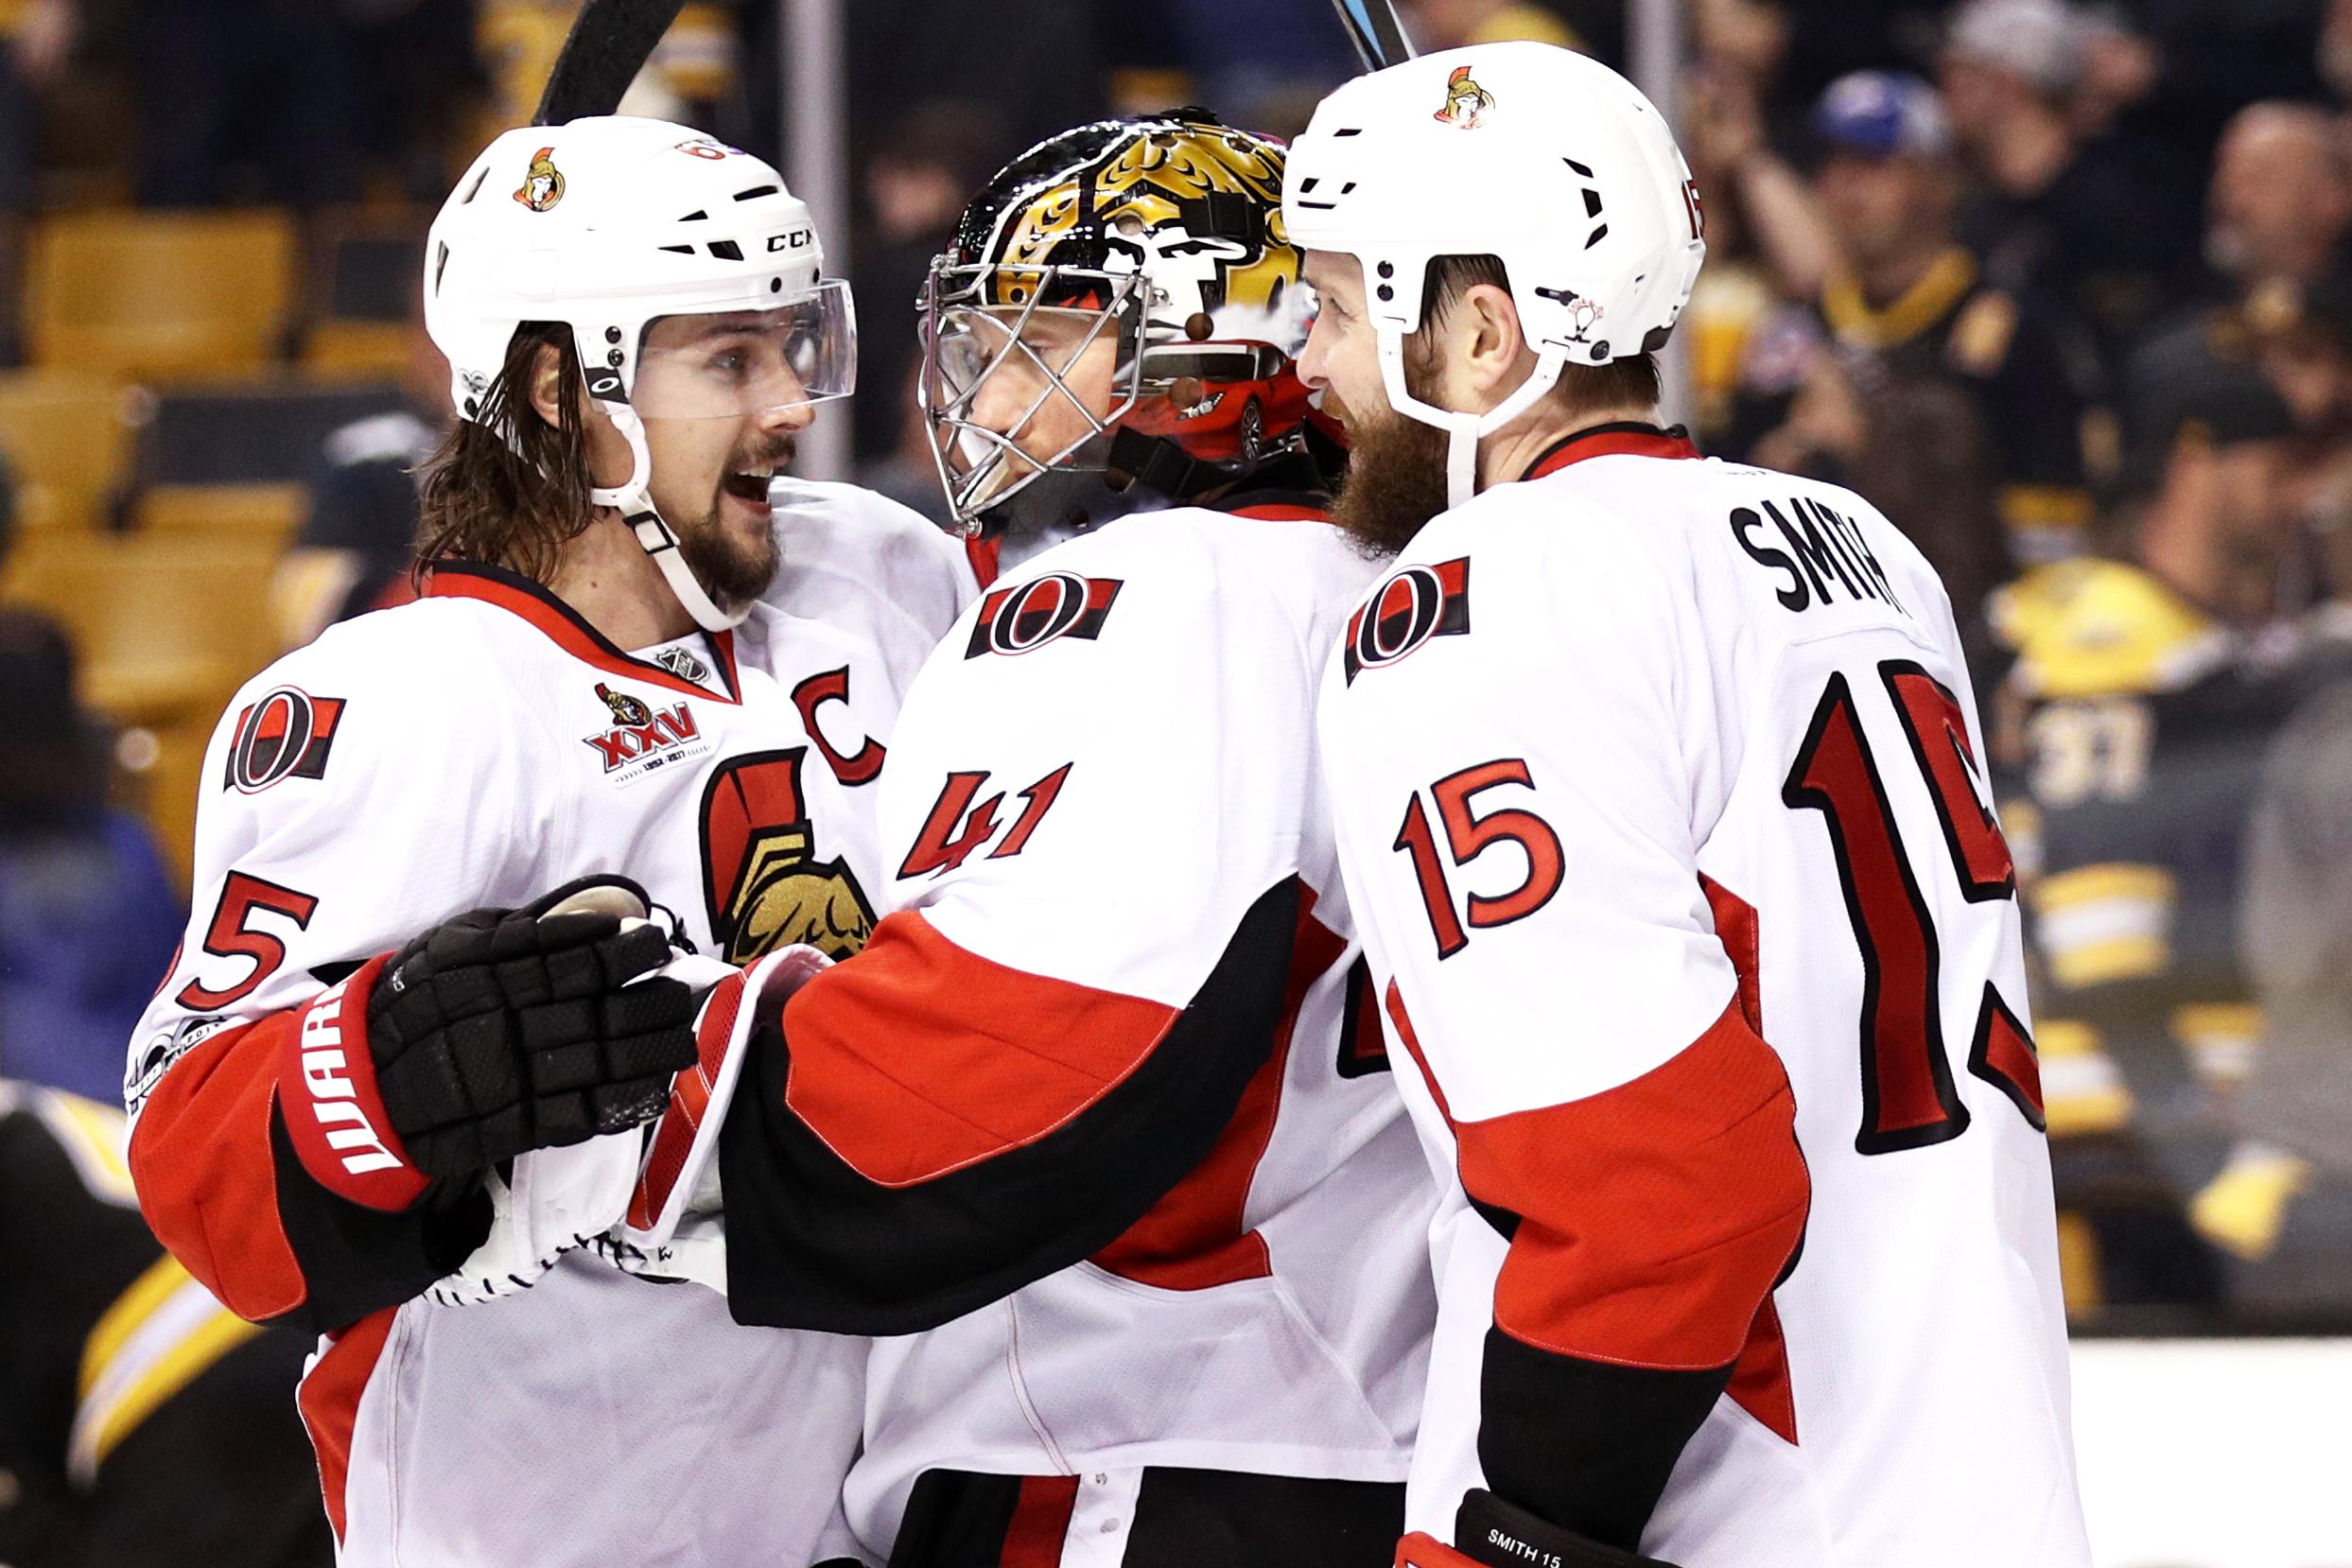 Kuraly's 2nd goal of game lifts Bruins past Senators in 2OT